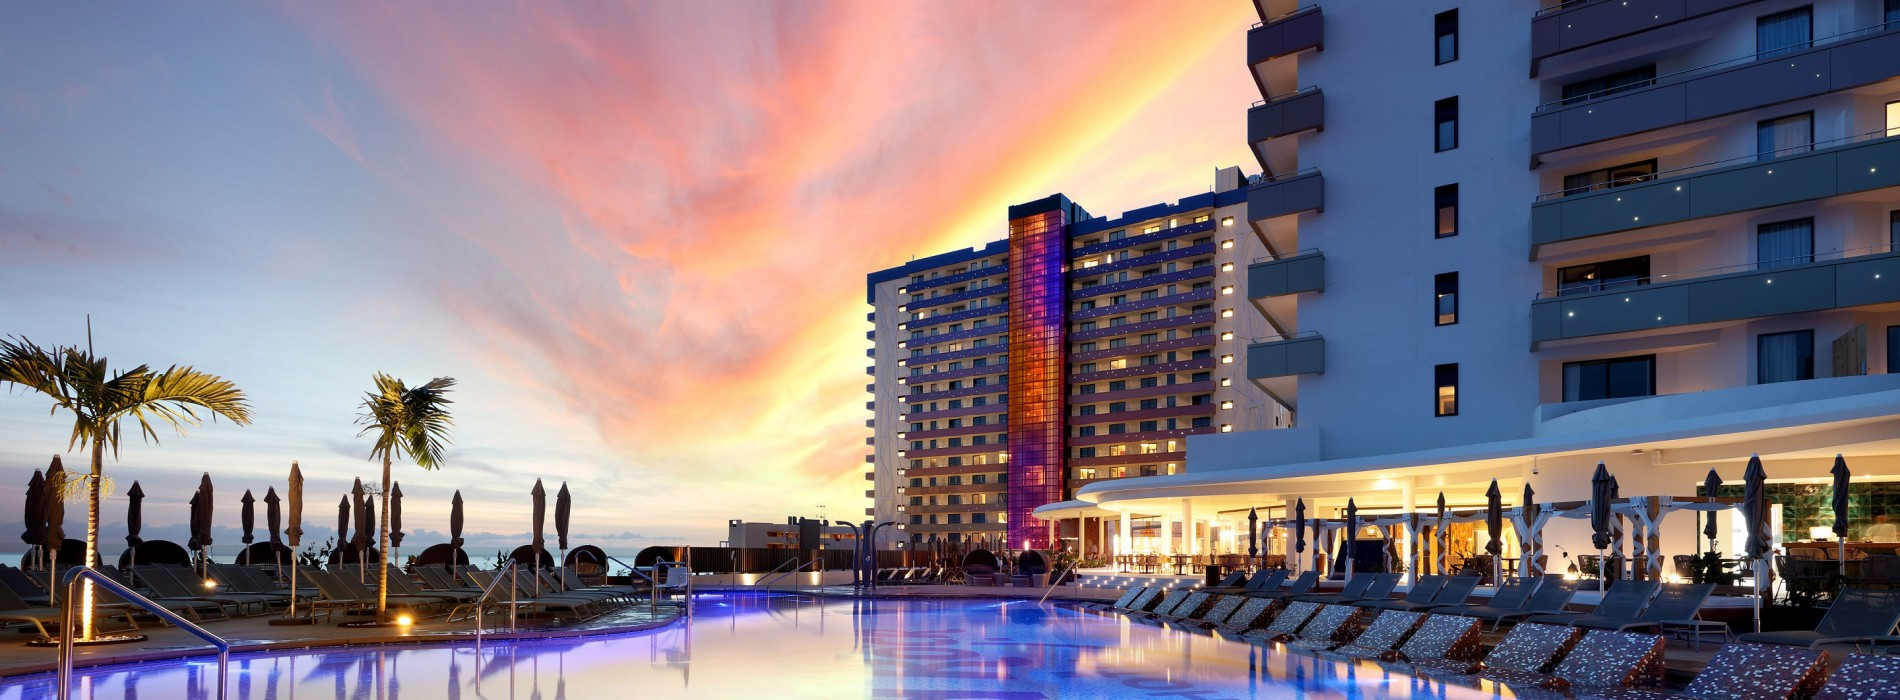 Samantha Fox, Mullett, 2Unlimited and Corona to play at Hard Rock Hotel Tenerife